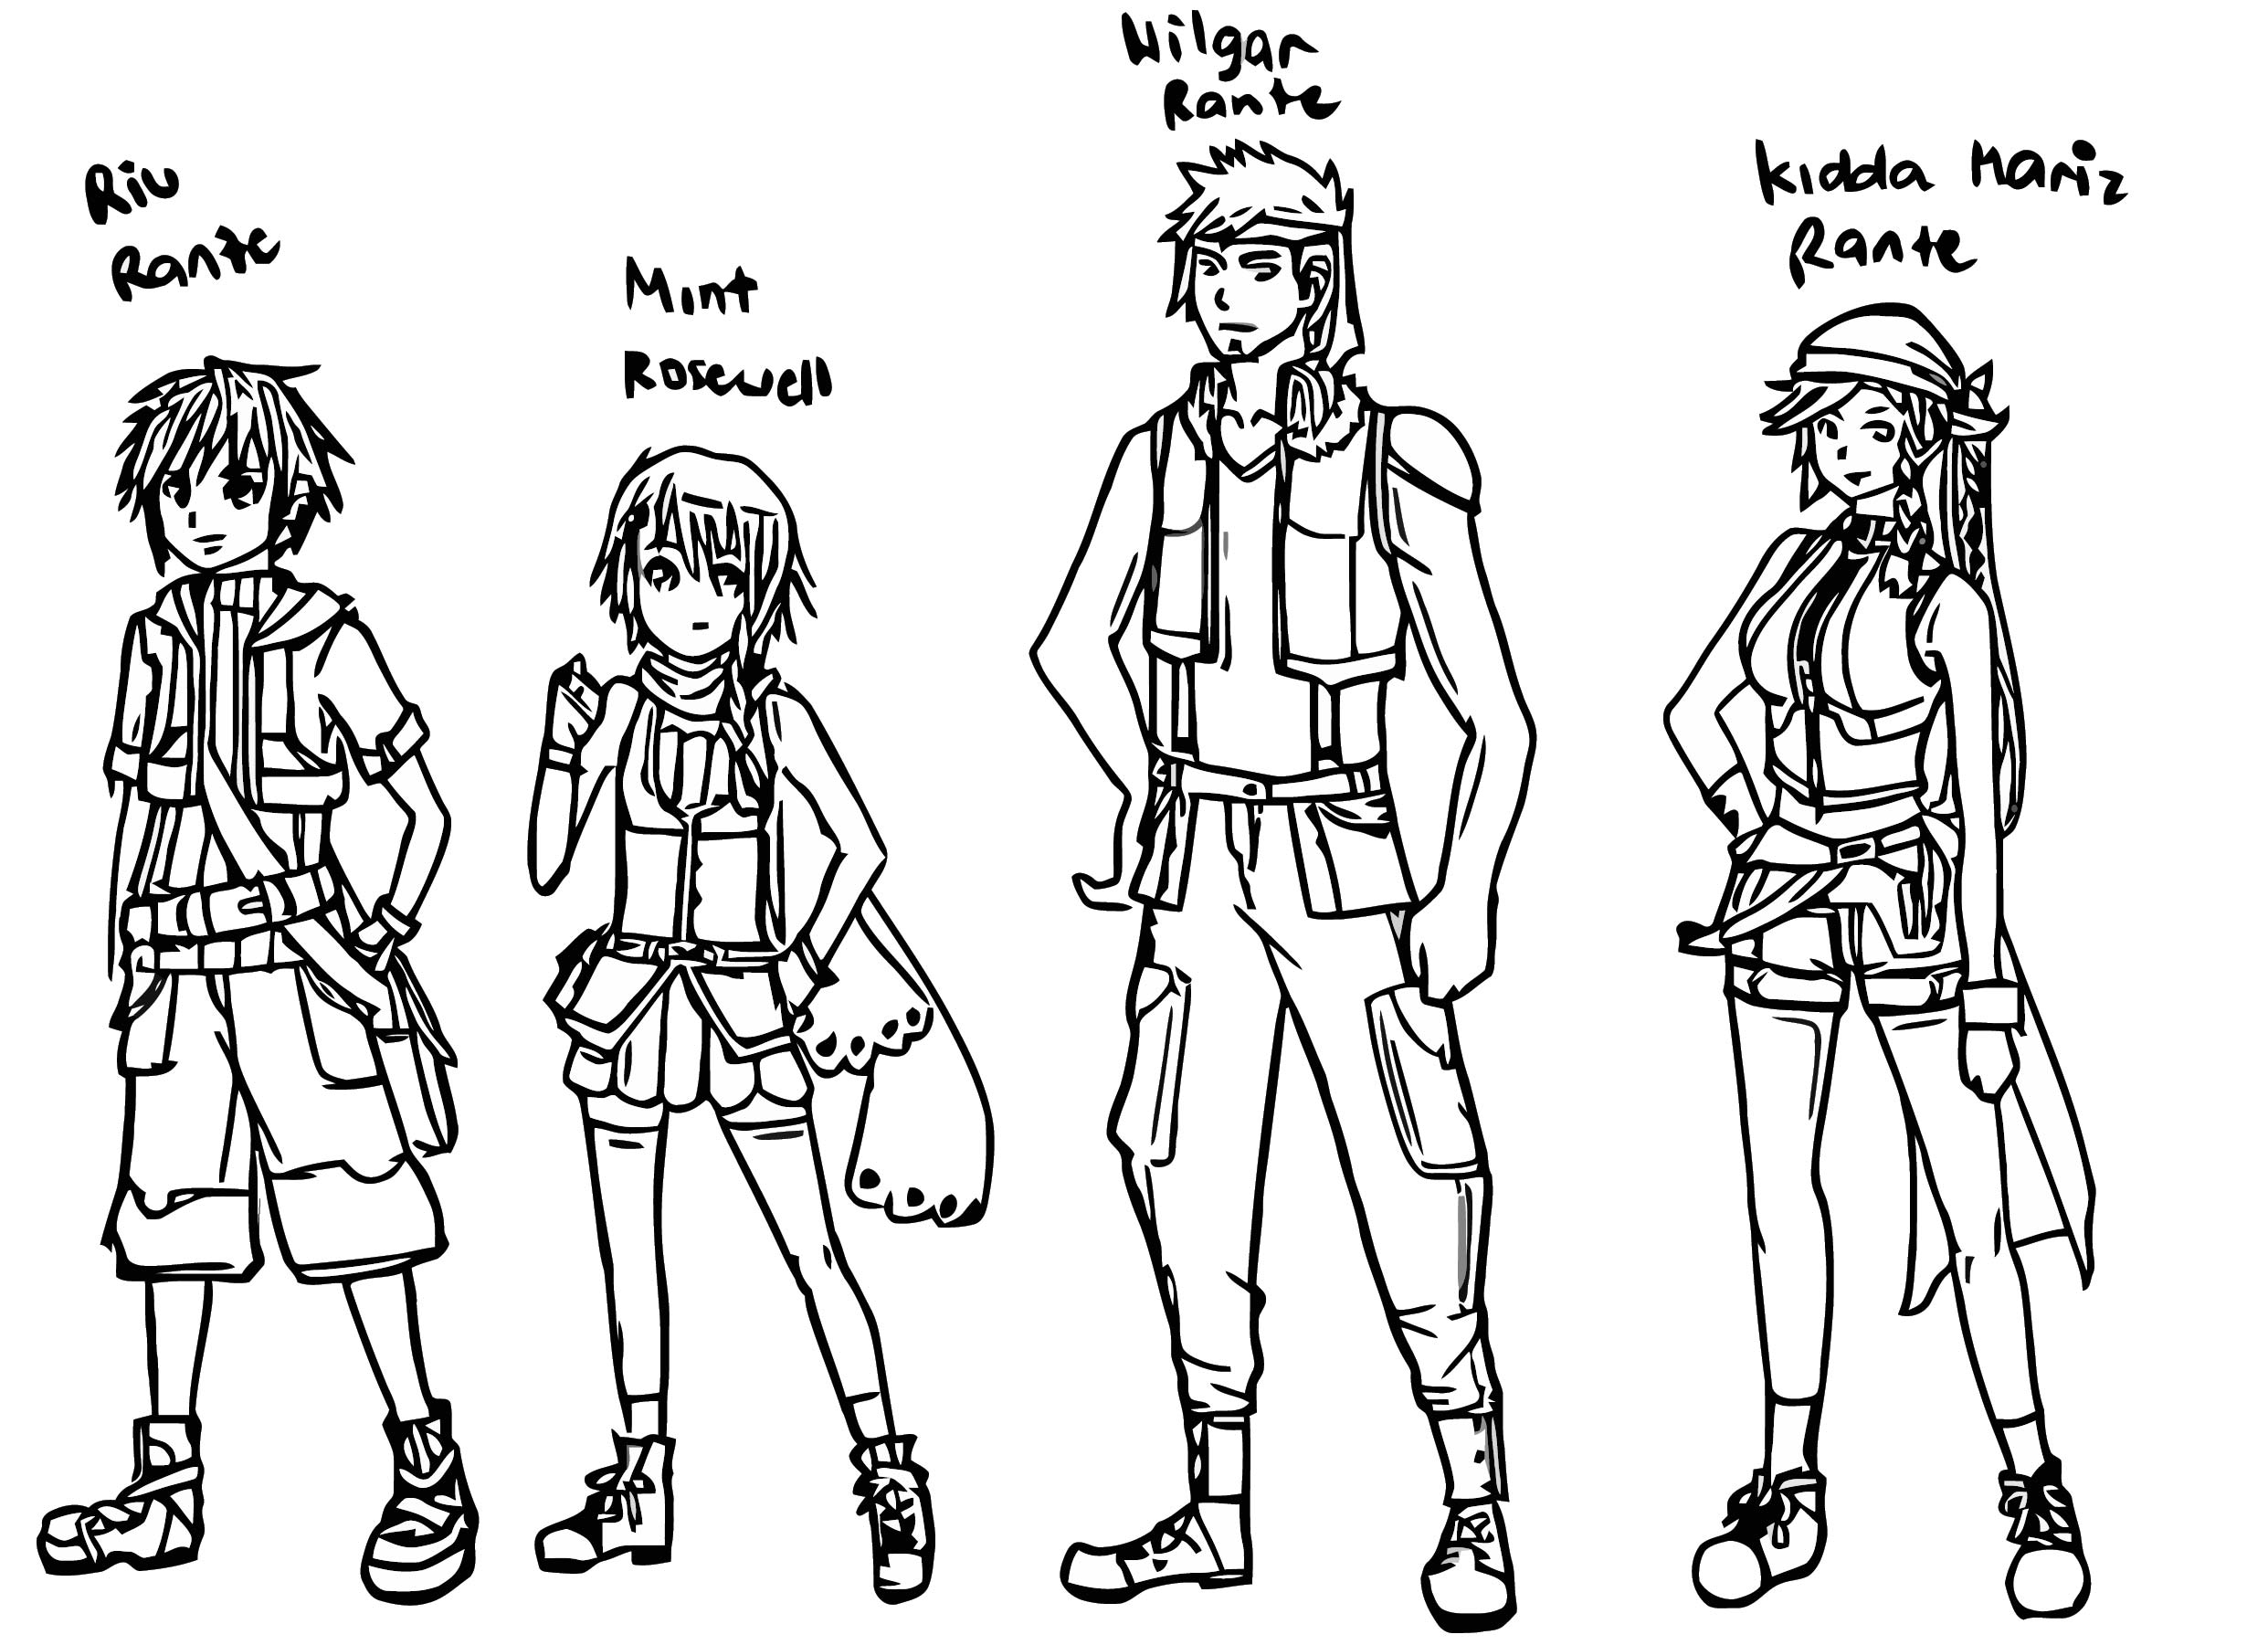 Oc Character Design Bente Unerz36 D3hqw0t Cartoonize Coloring Page